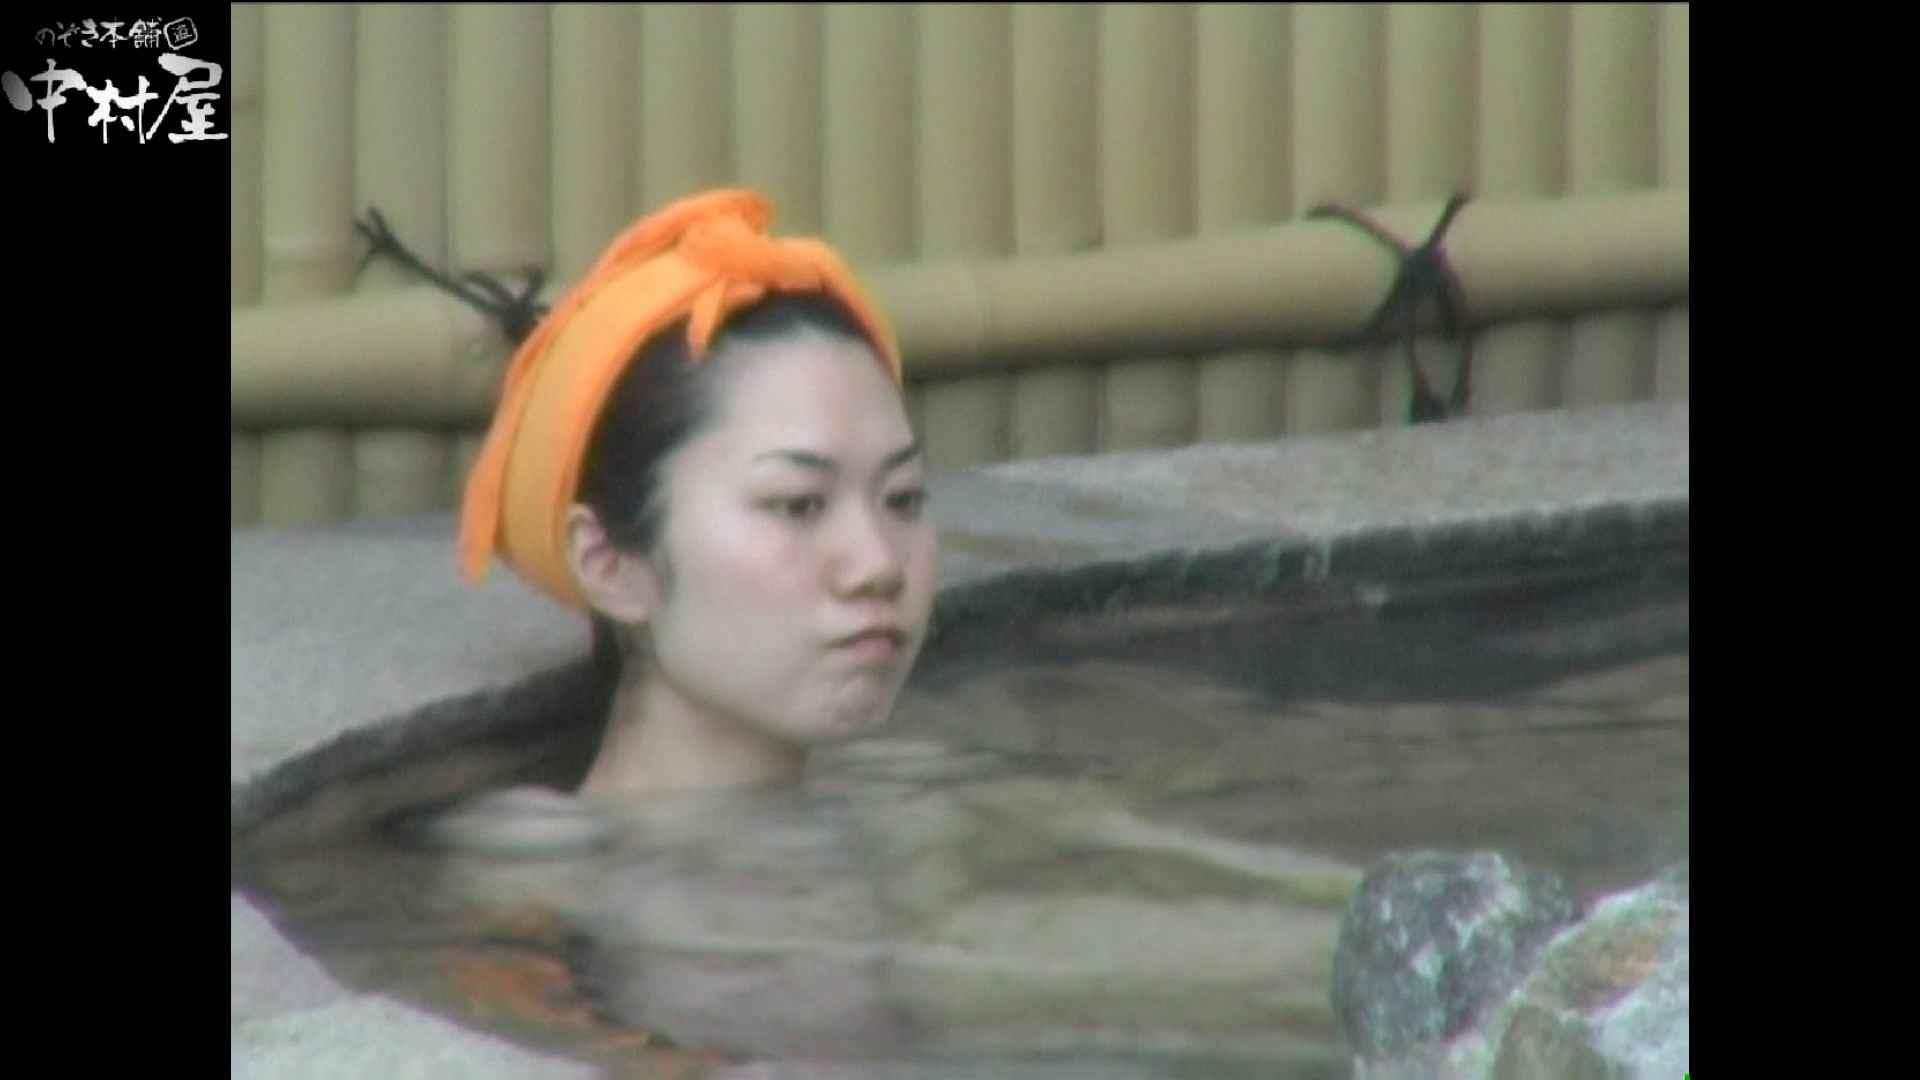 Aquaな露天風呂Vol.978 OLセックス | 露天  77画像 1